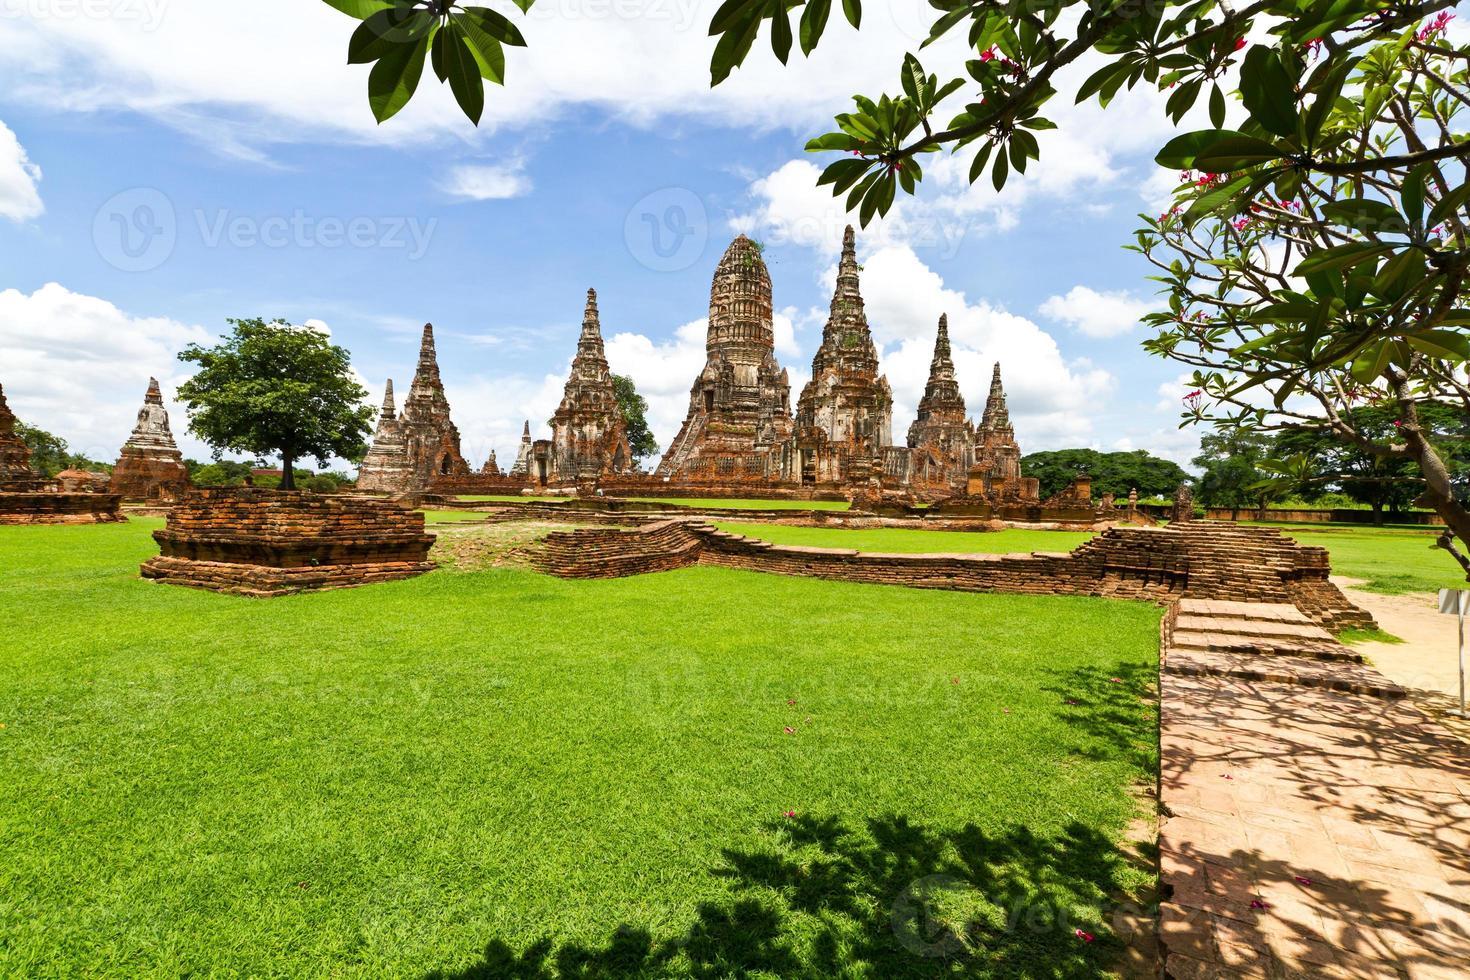 pagoda en el templo de wat chaiwattanaram, ayutthaya, tailandia foto